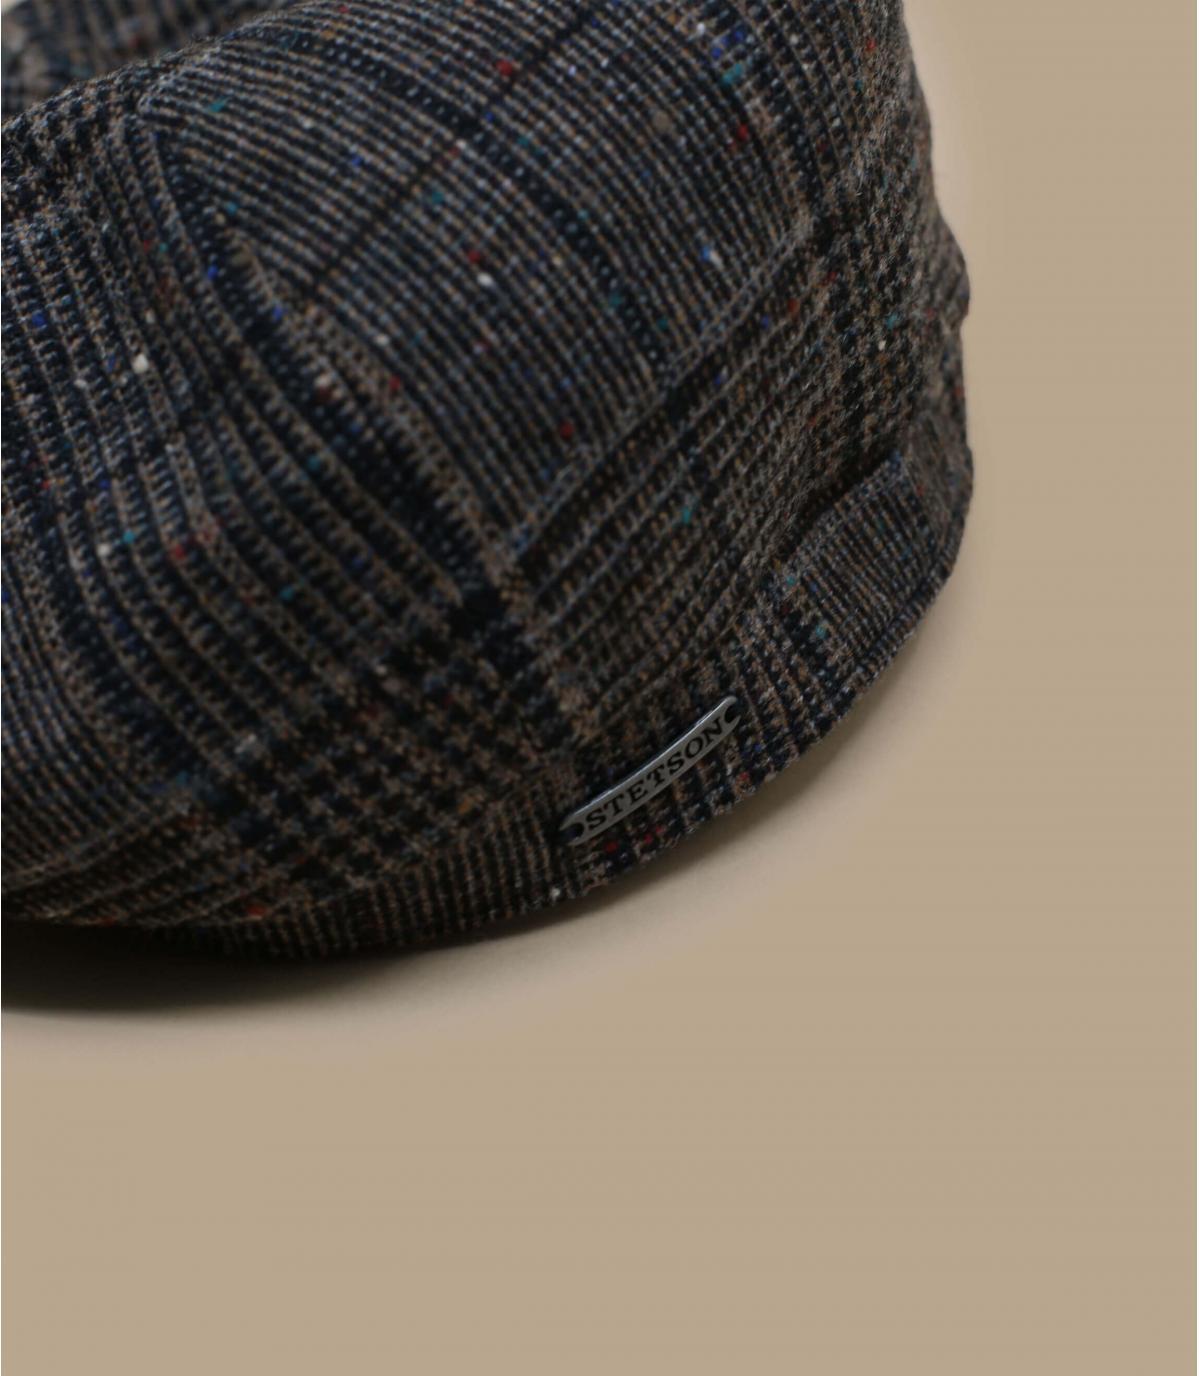 Detalles Hatteras Wool brown check imagen 2